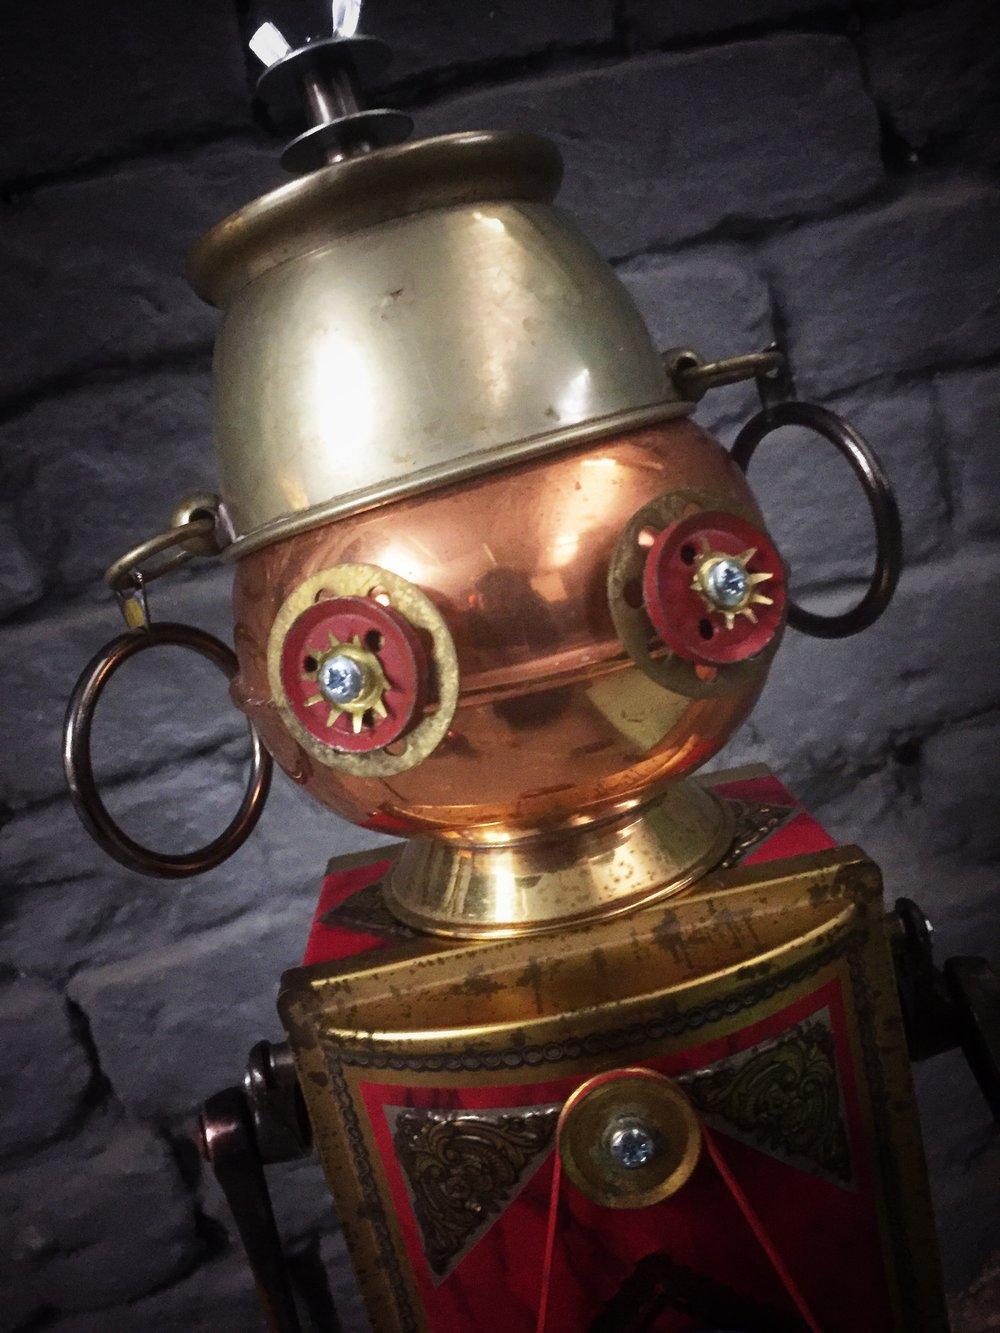 Image of Gypsy Rose 'bot